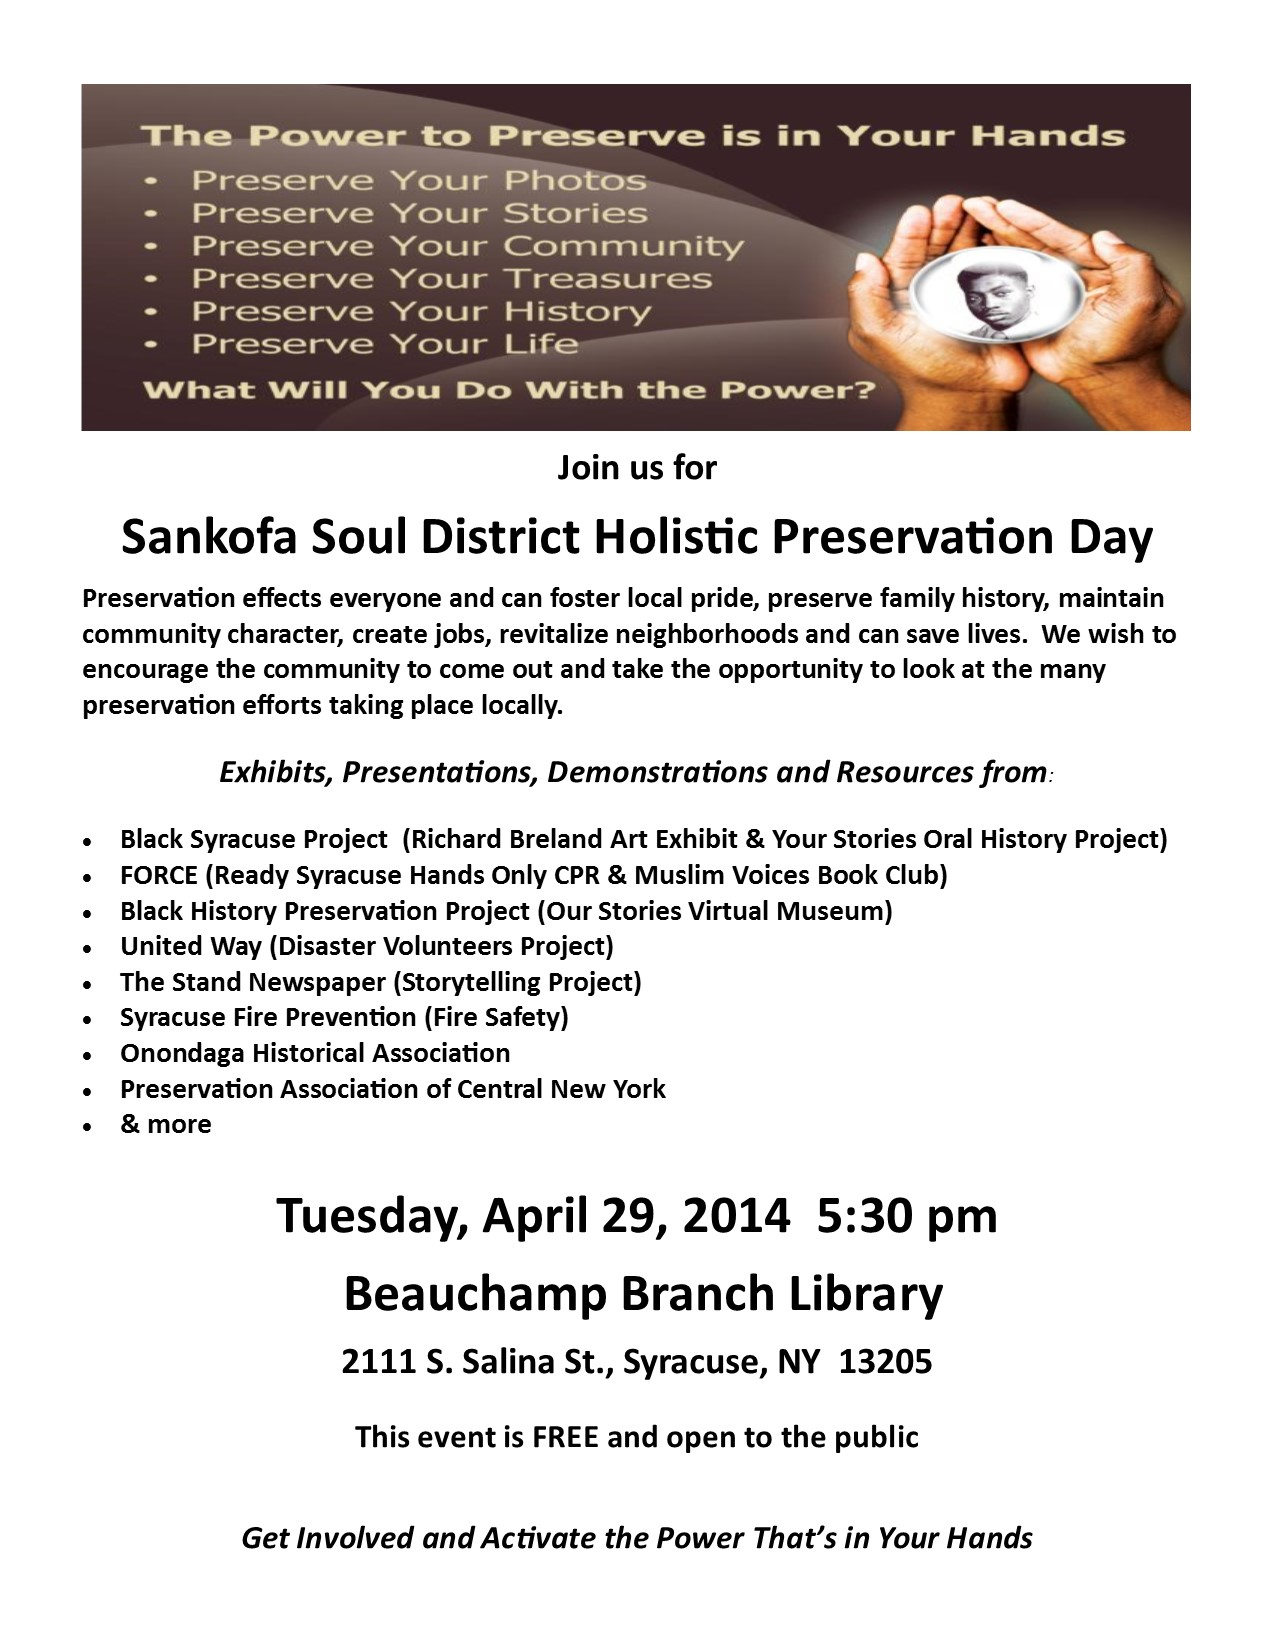 Sankofa Soul District Holistic Preservation Day Flier